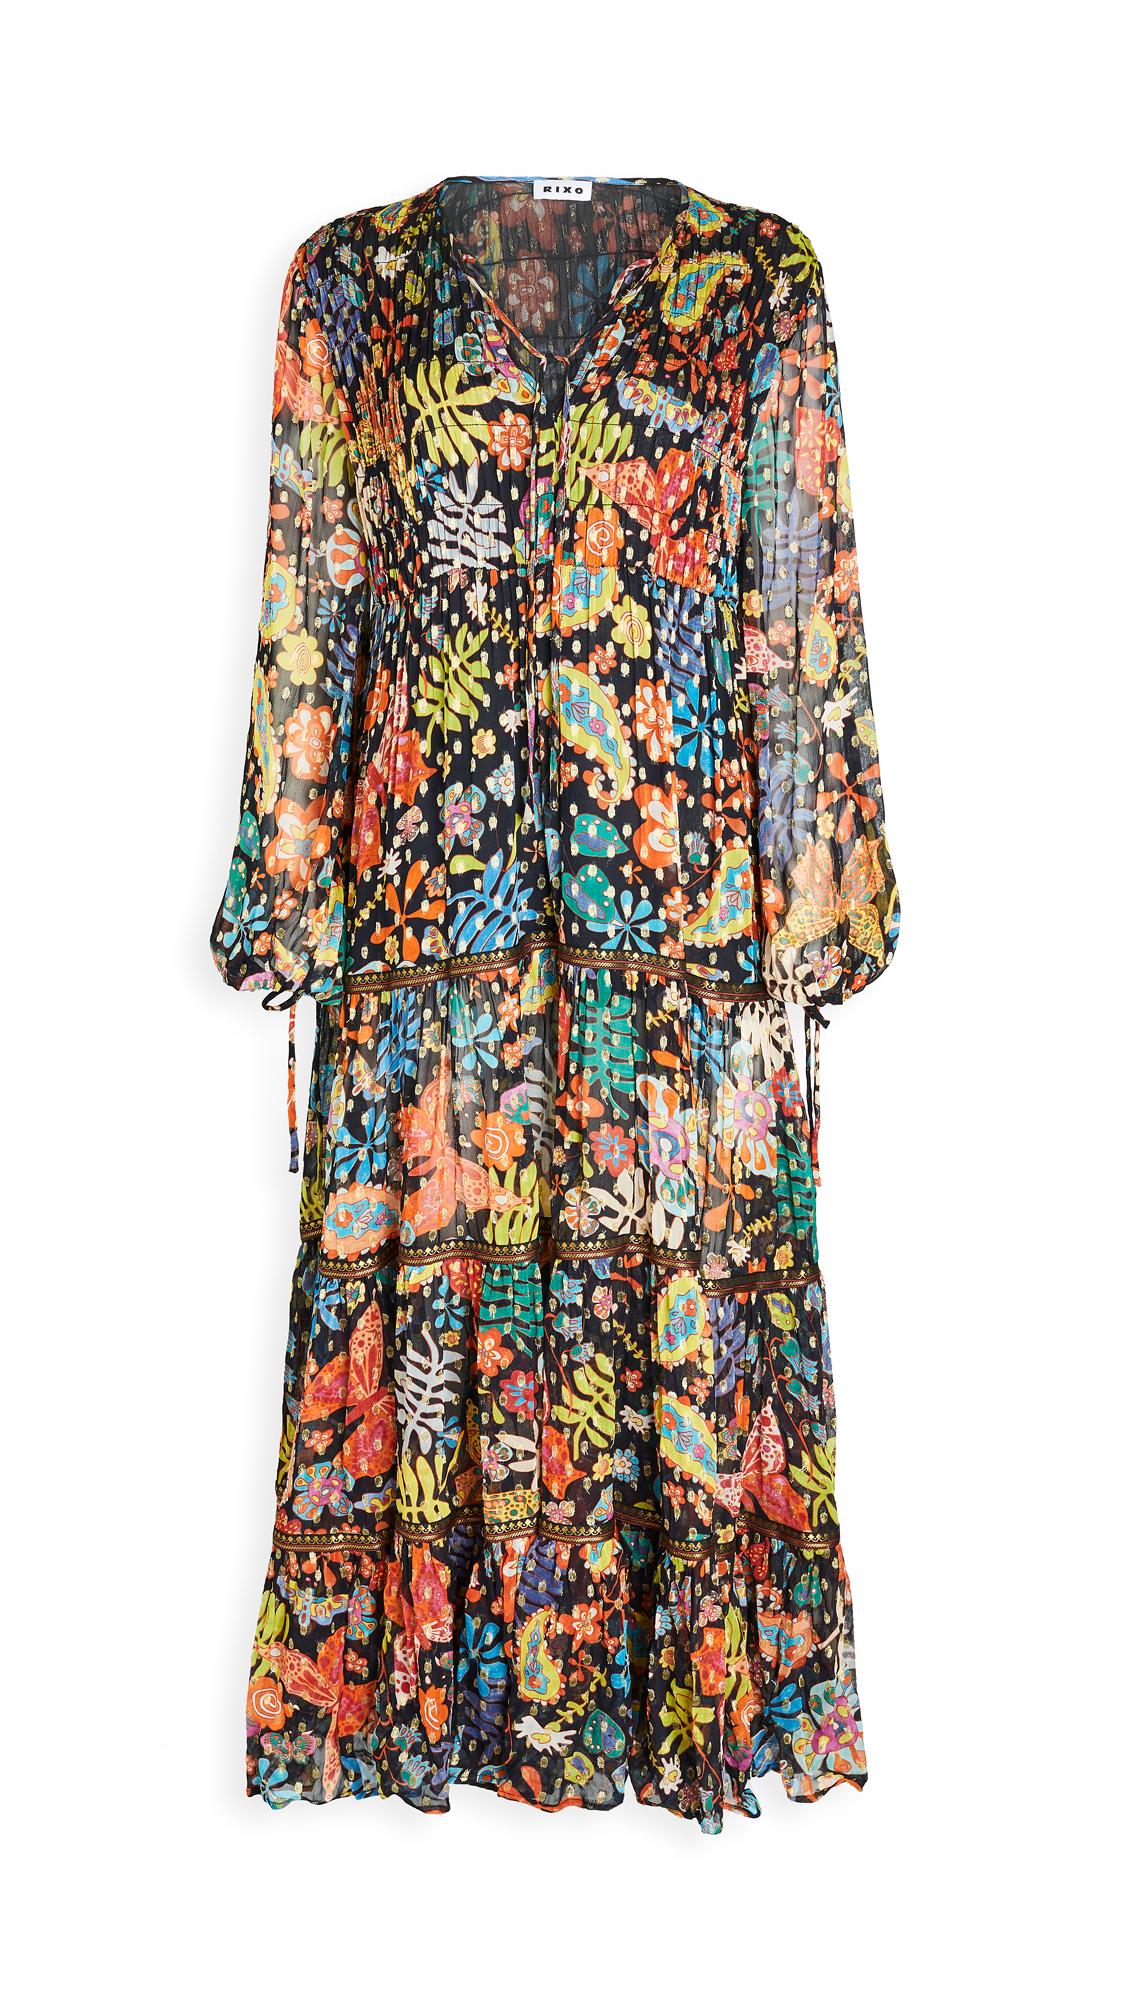 RIXO Lori Dress - 30% Off Sale